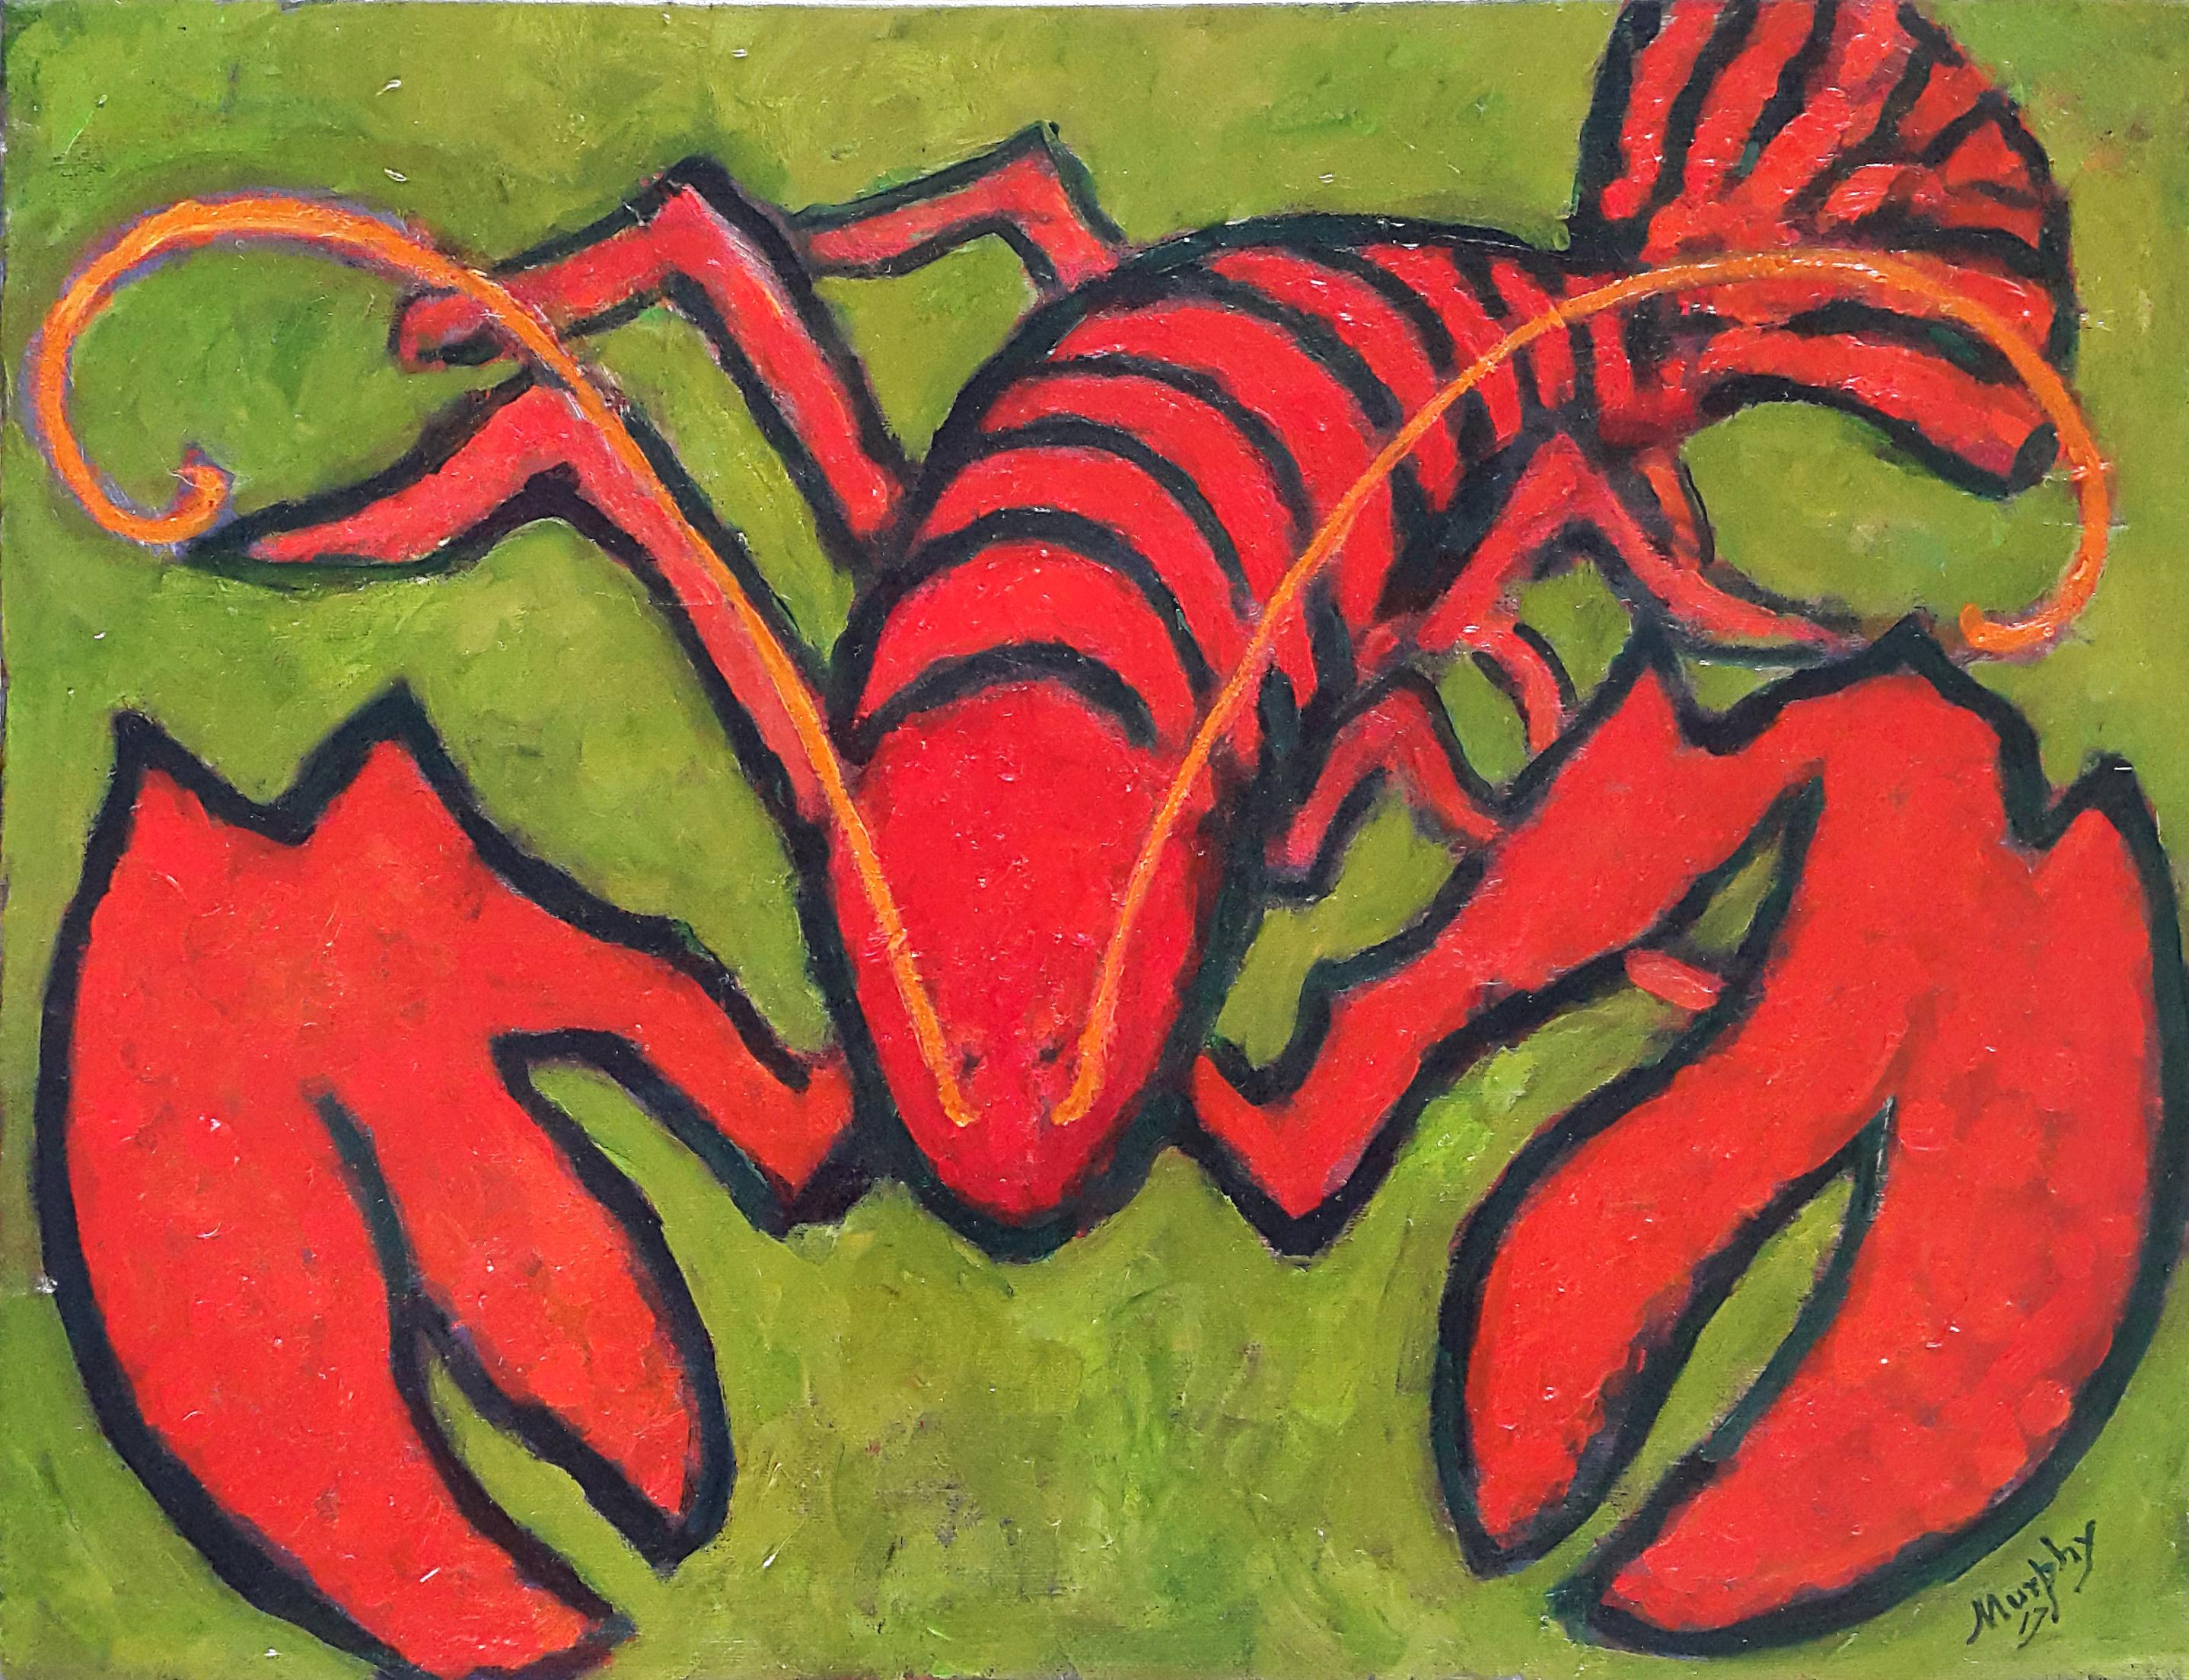 The Lobster 65 x 50 cmoil on canvas